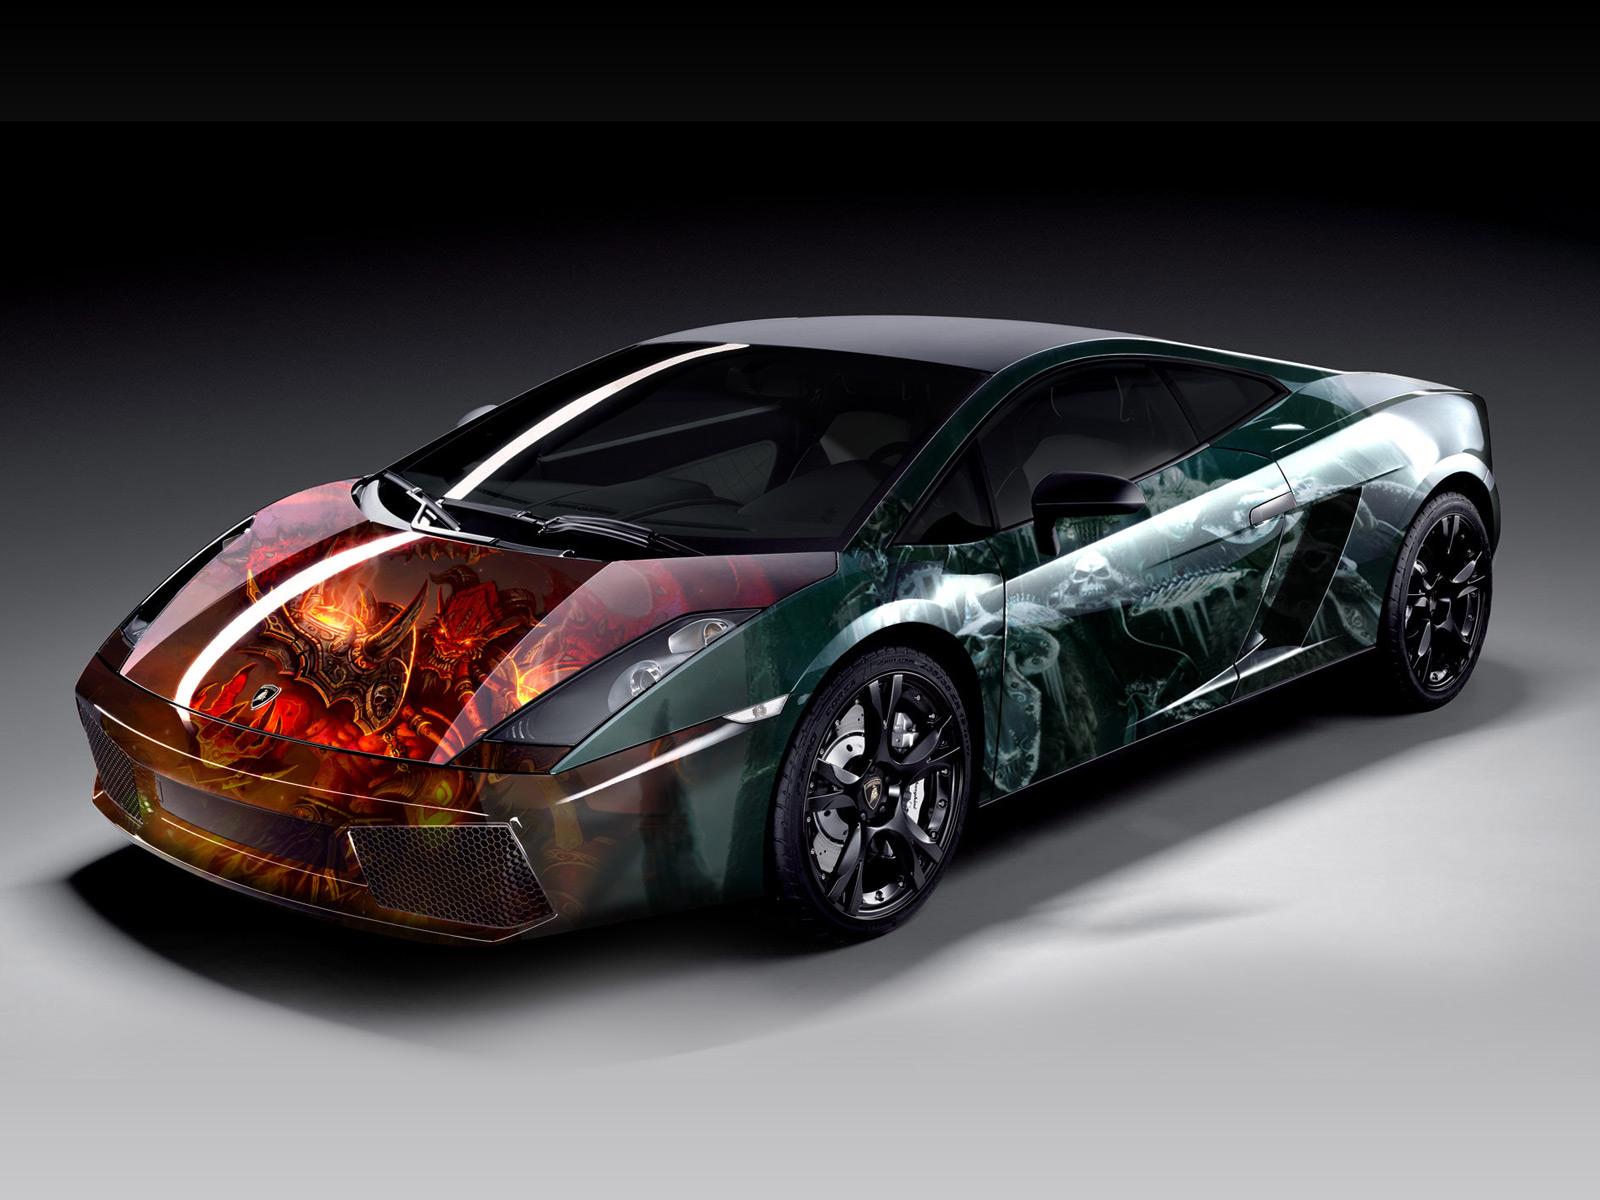 ALL SPORTS CARS SPORTS BIKES Cool Sports Cars HD Wallpapers 1600x1200